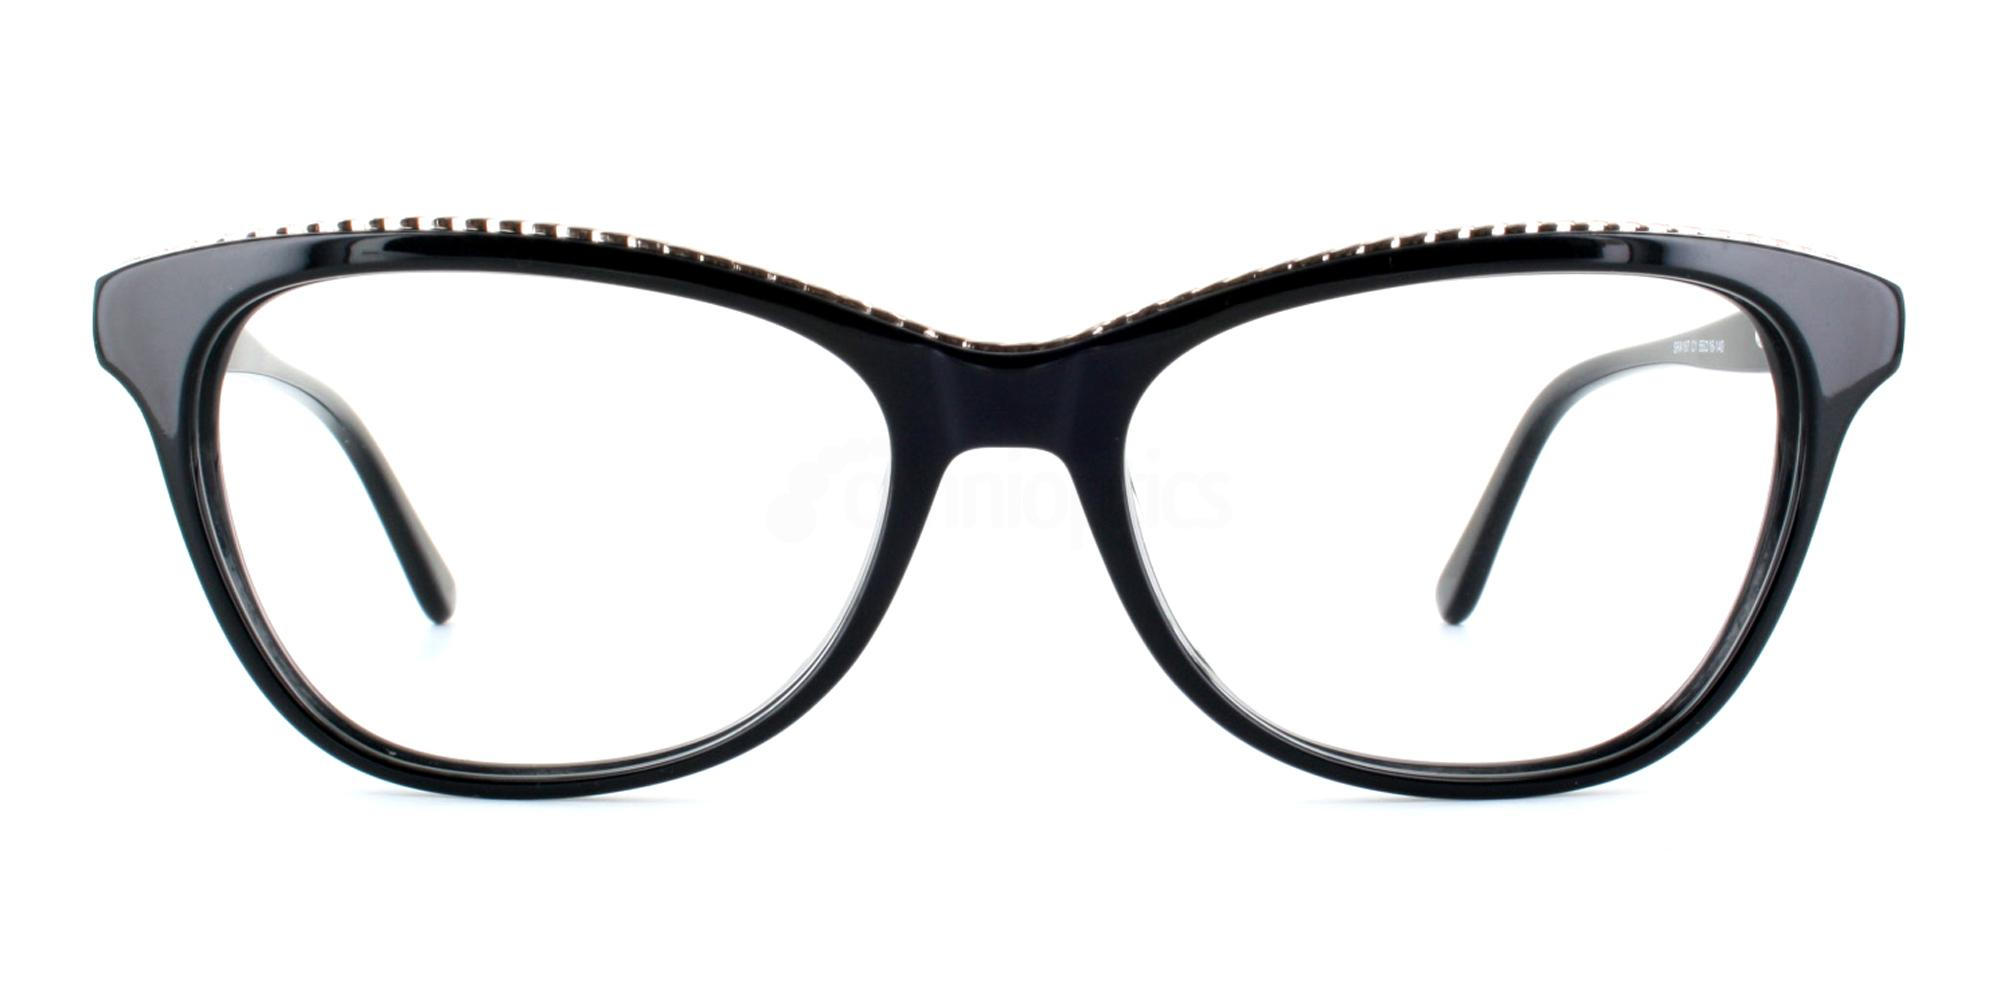 C1 SRA167 Glasses, SelectSpecs